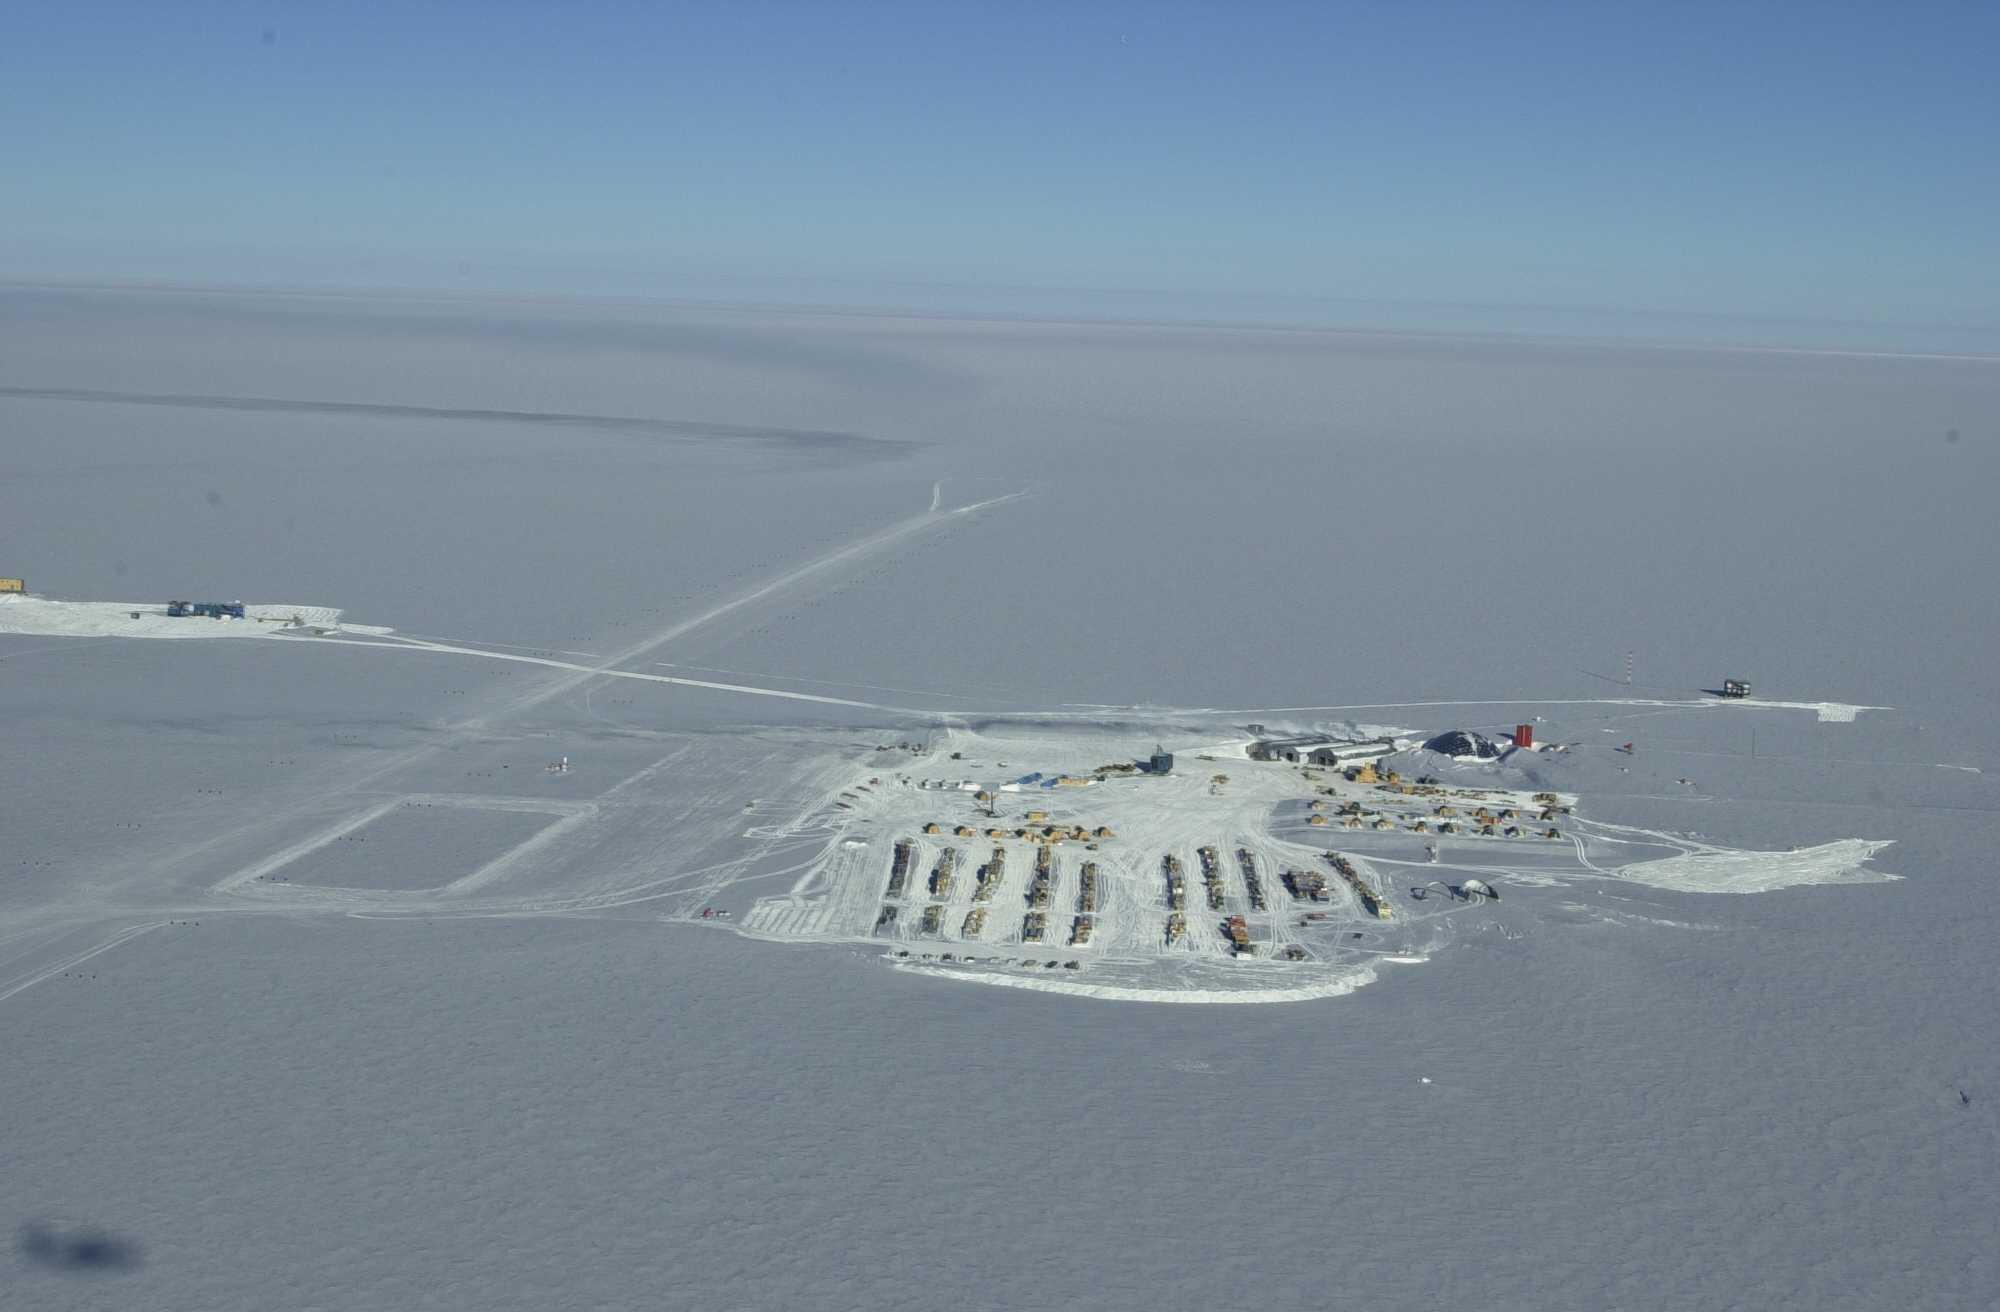 http://southpolestation.com/maps/aerial2k0.jpg